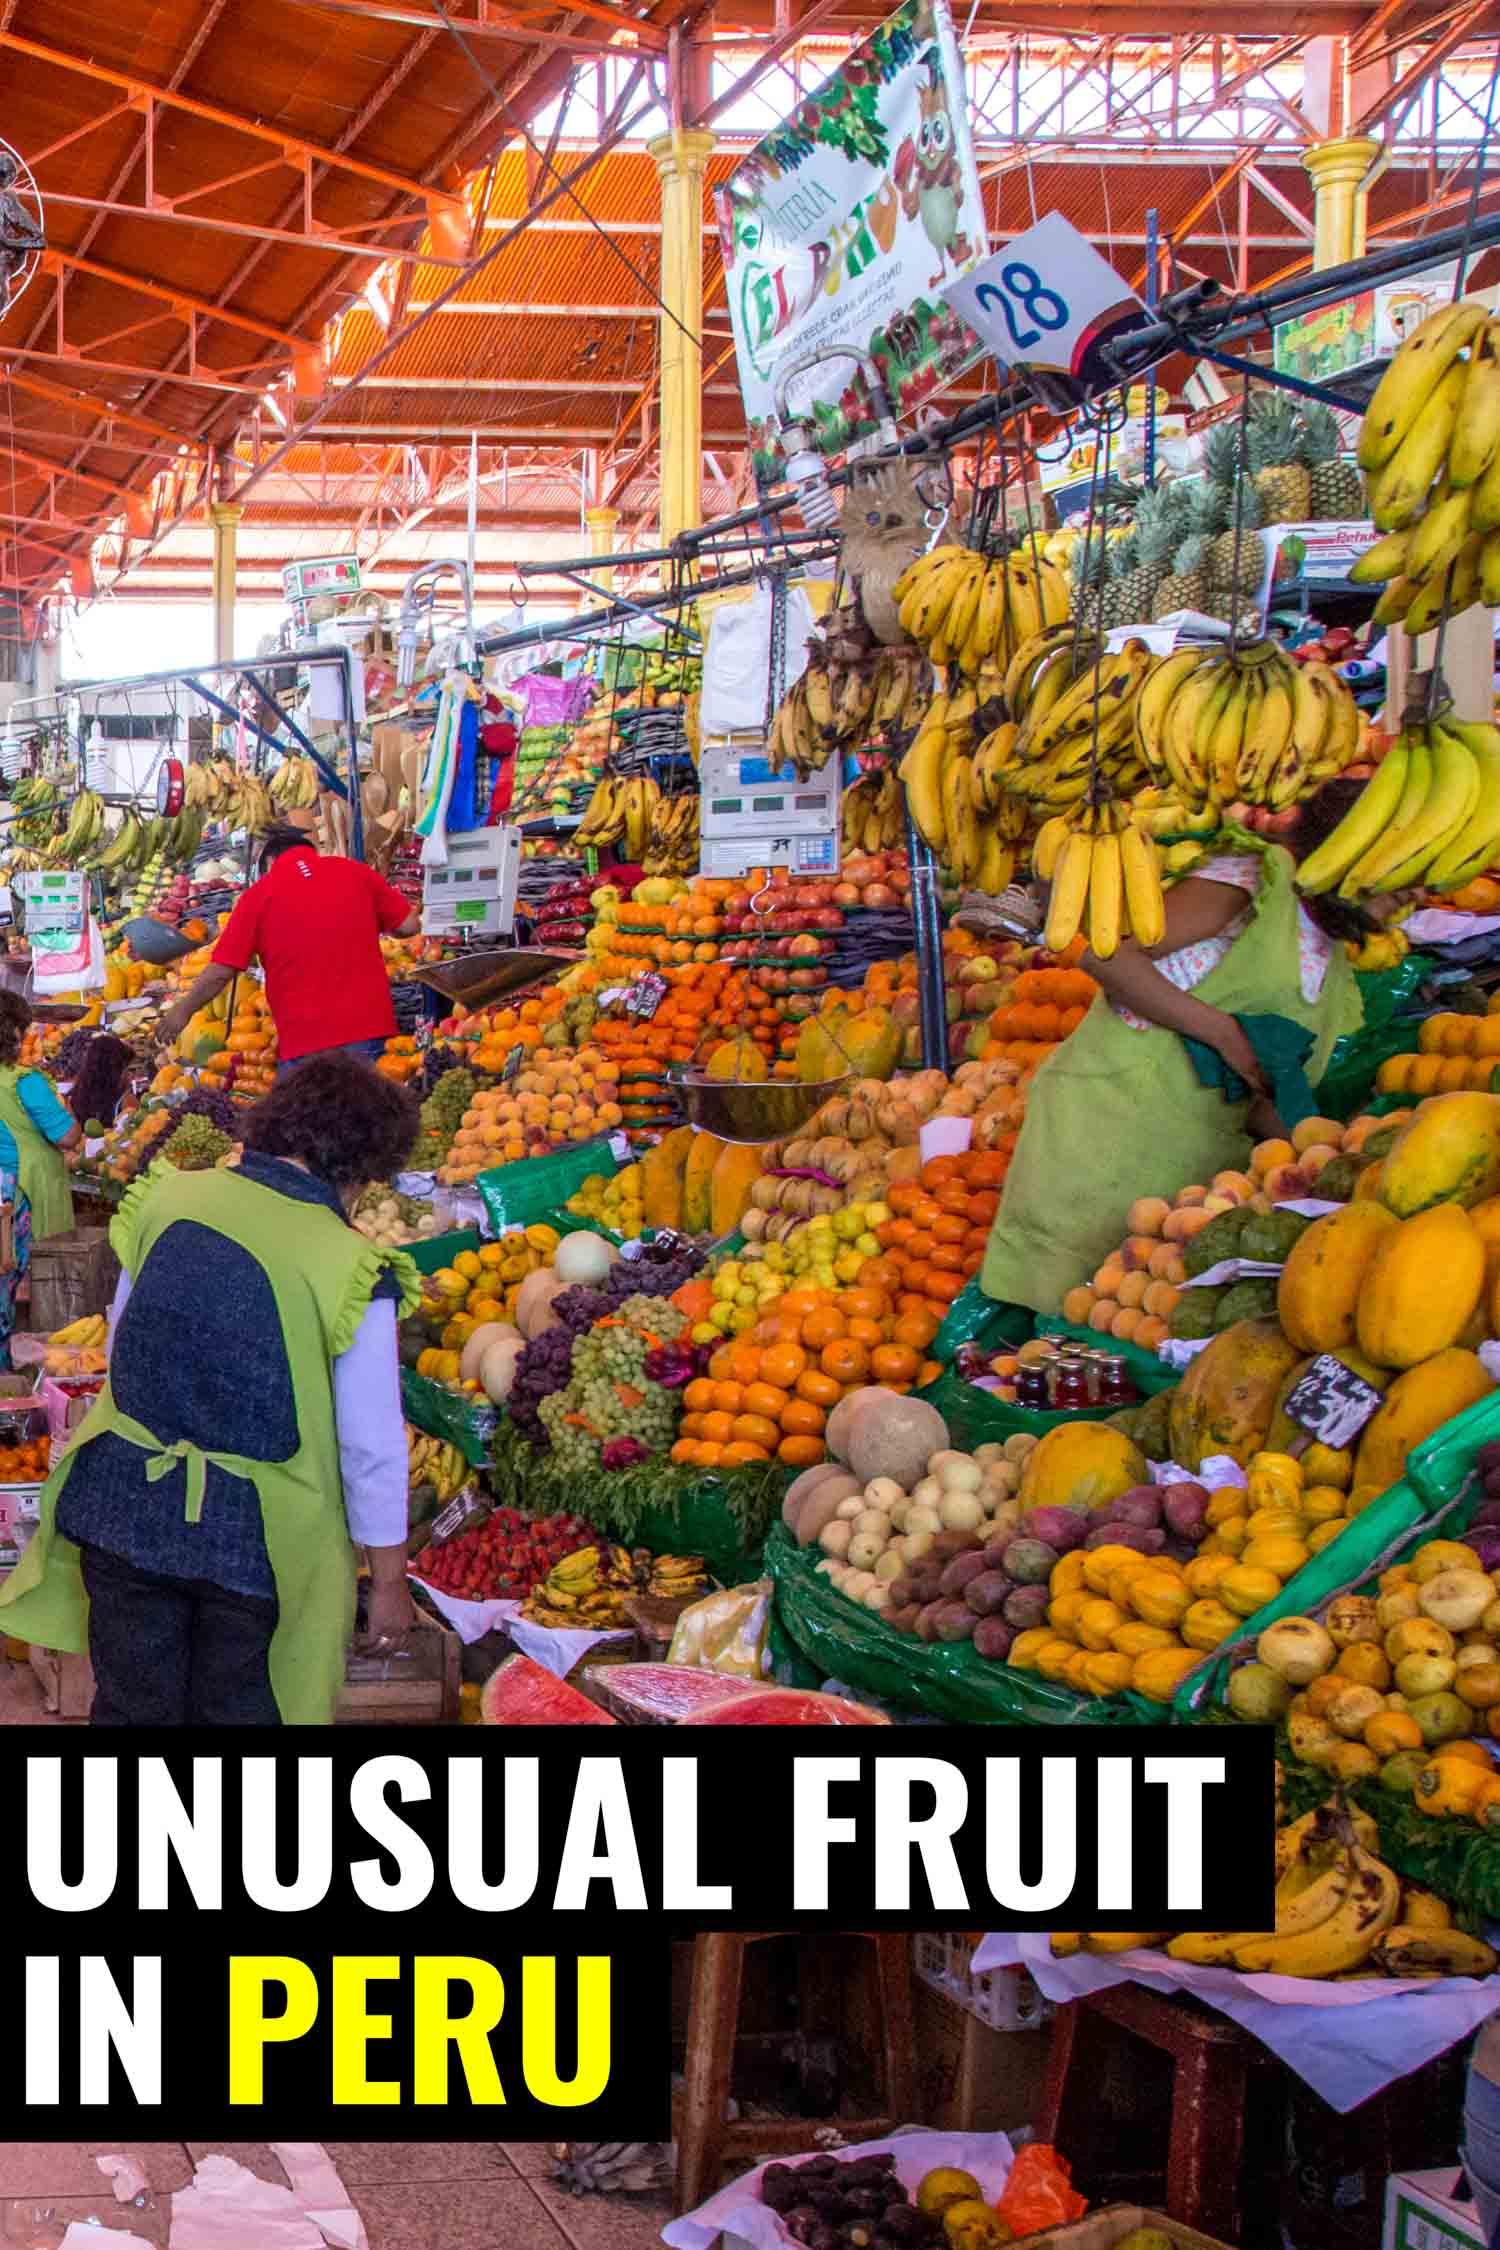 Fruit market in Peru